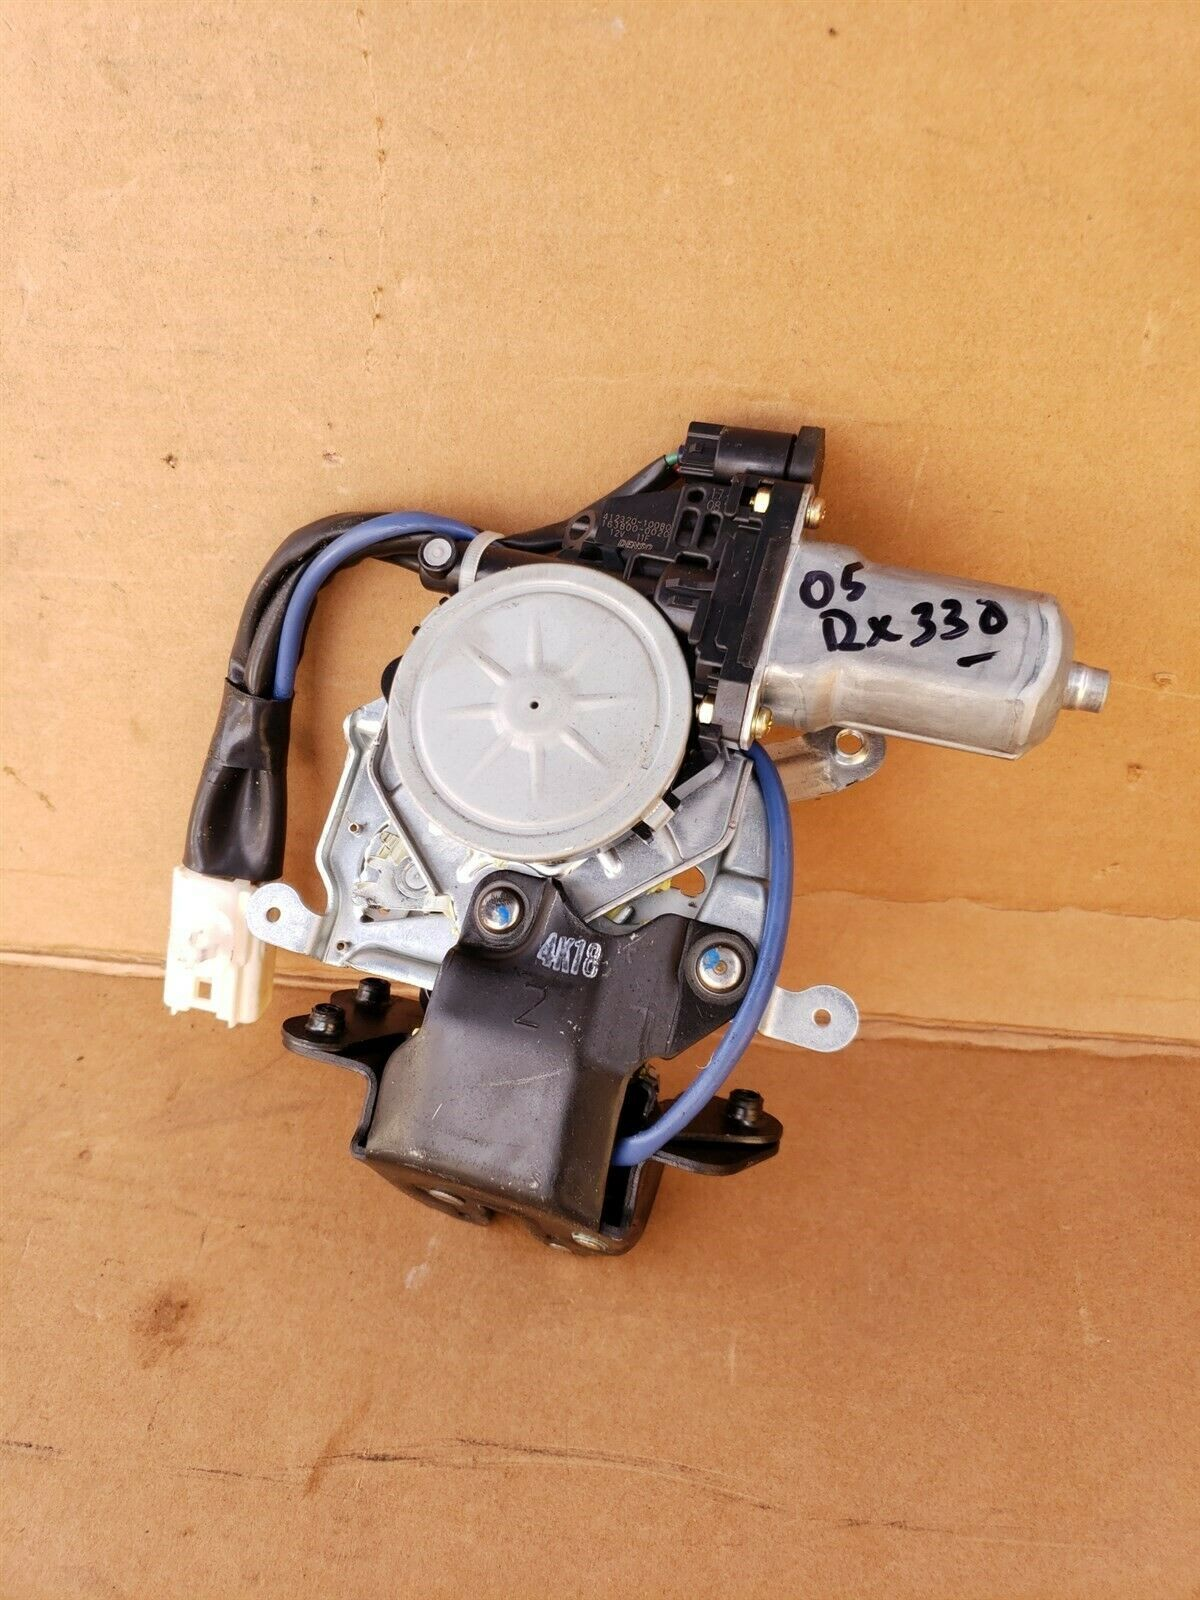 04-06 Lexus RX330 Rear Hatch Tailgate Liftgate Power Lock Latch Motor Actuator